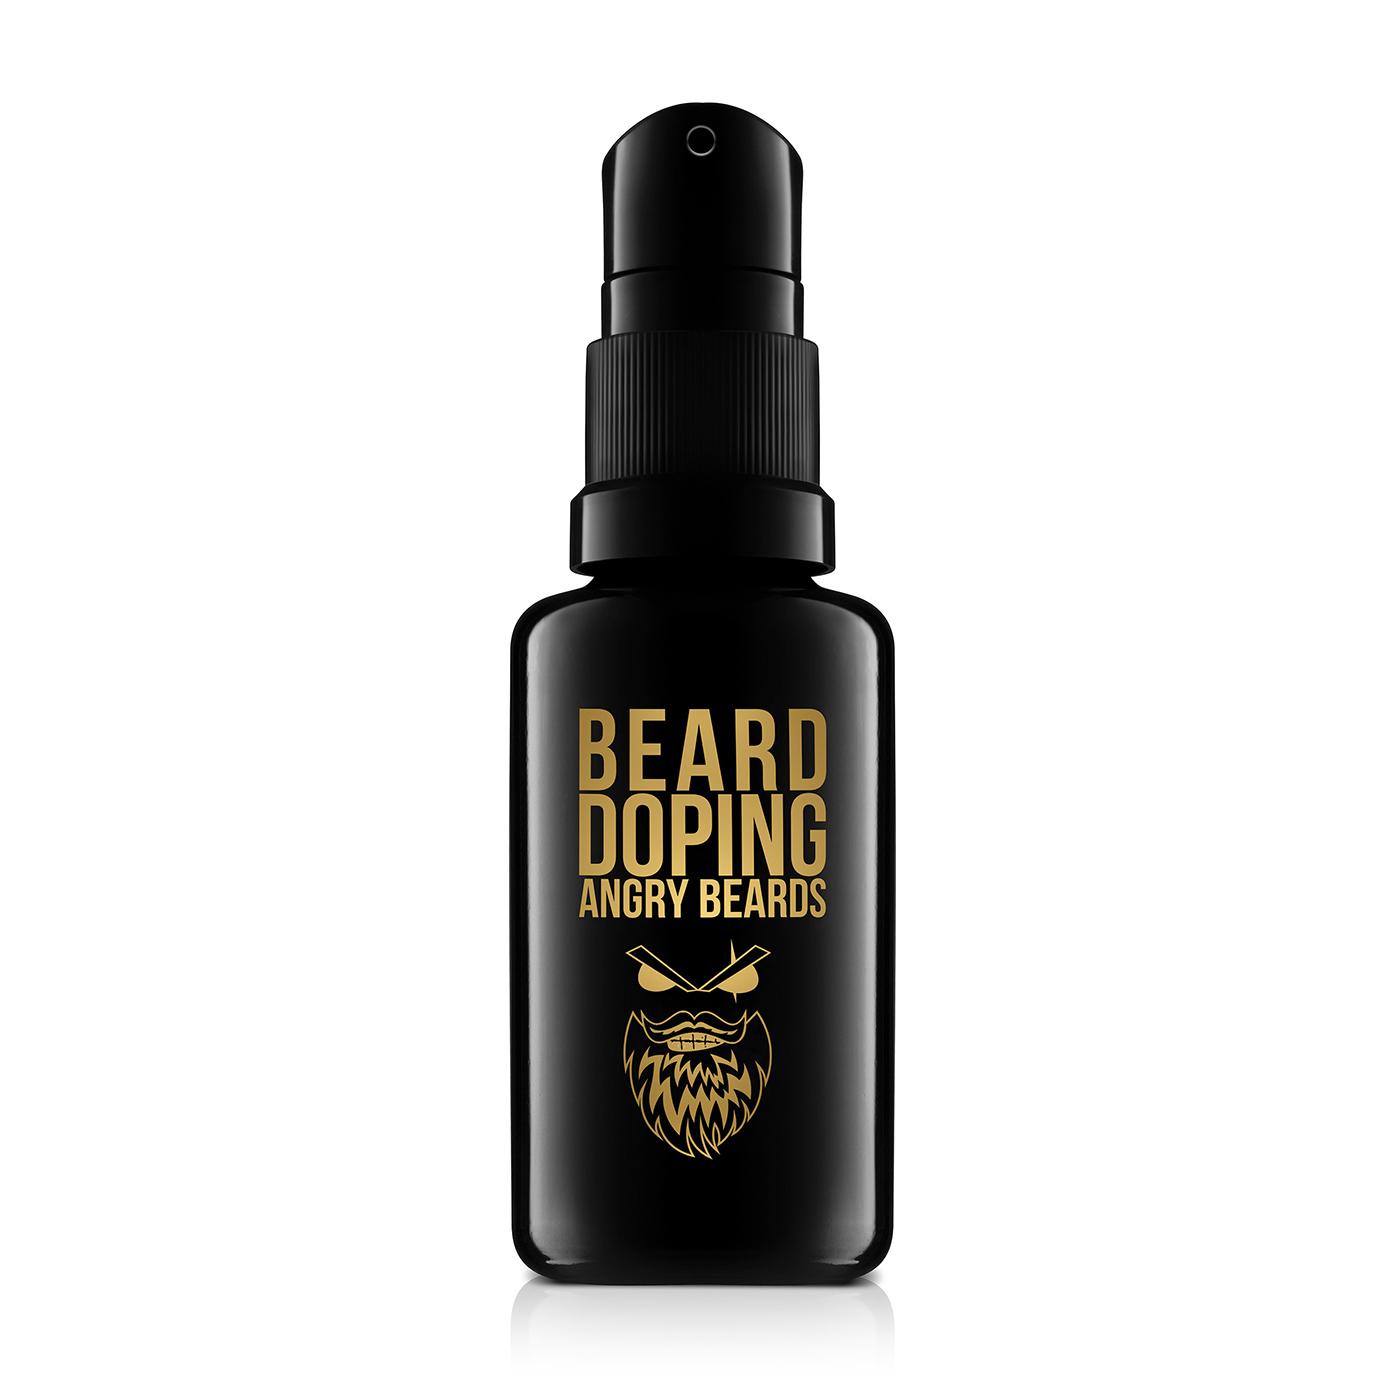 angry_beards-doping1